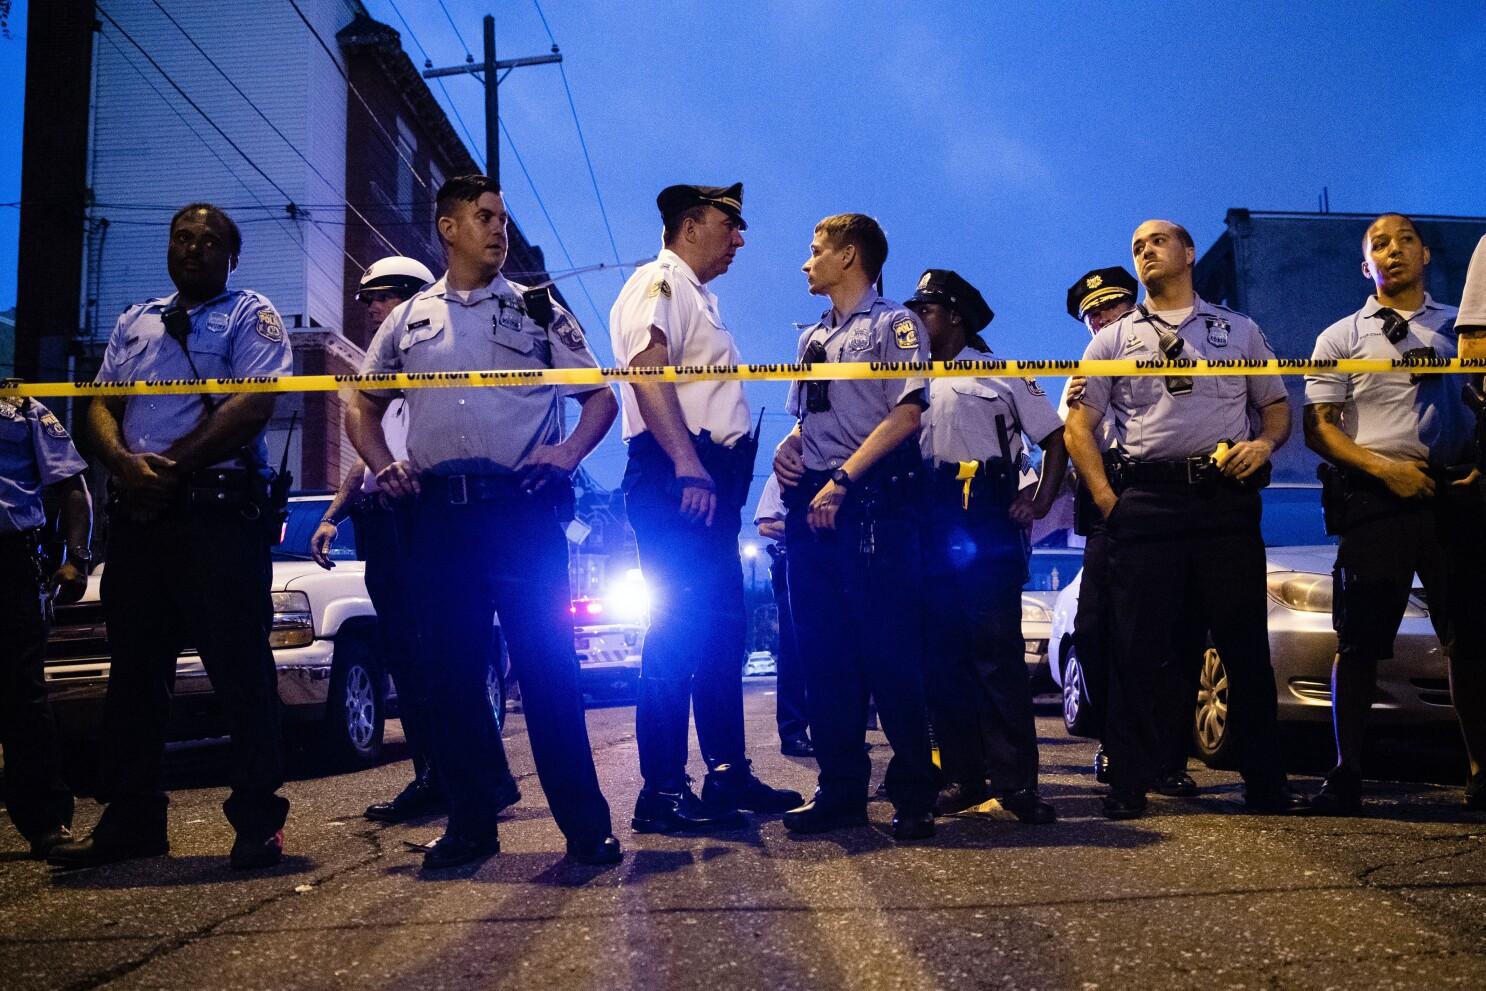 Philadelphia gunman identified after hours-long standoff